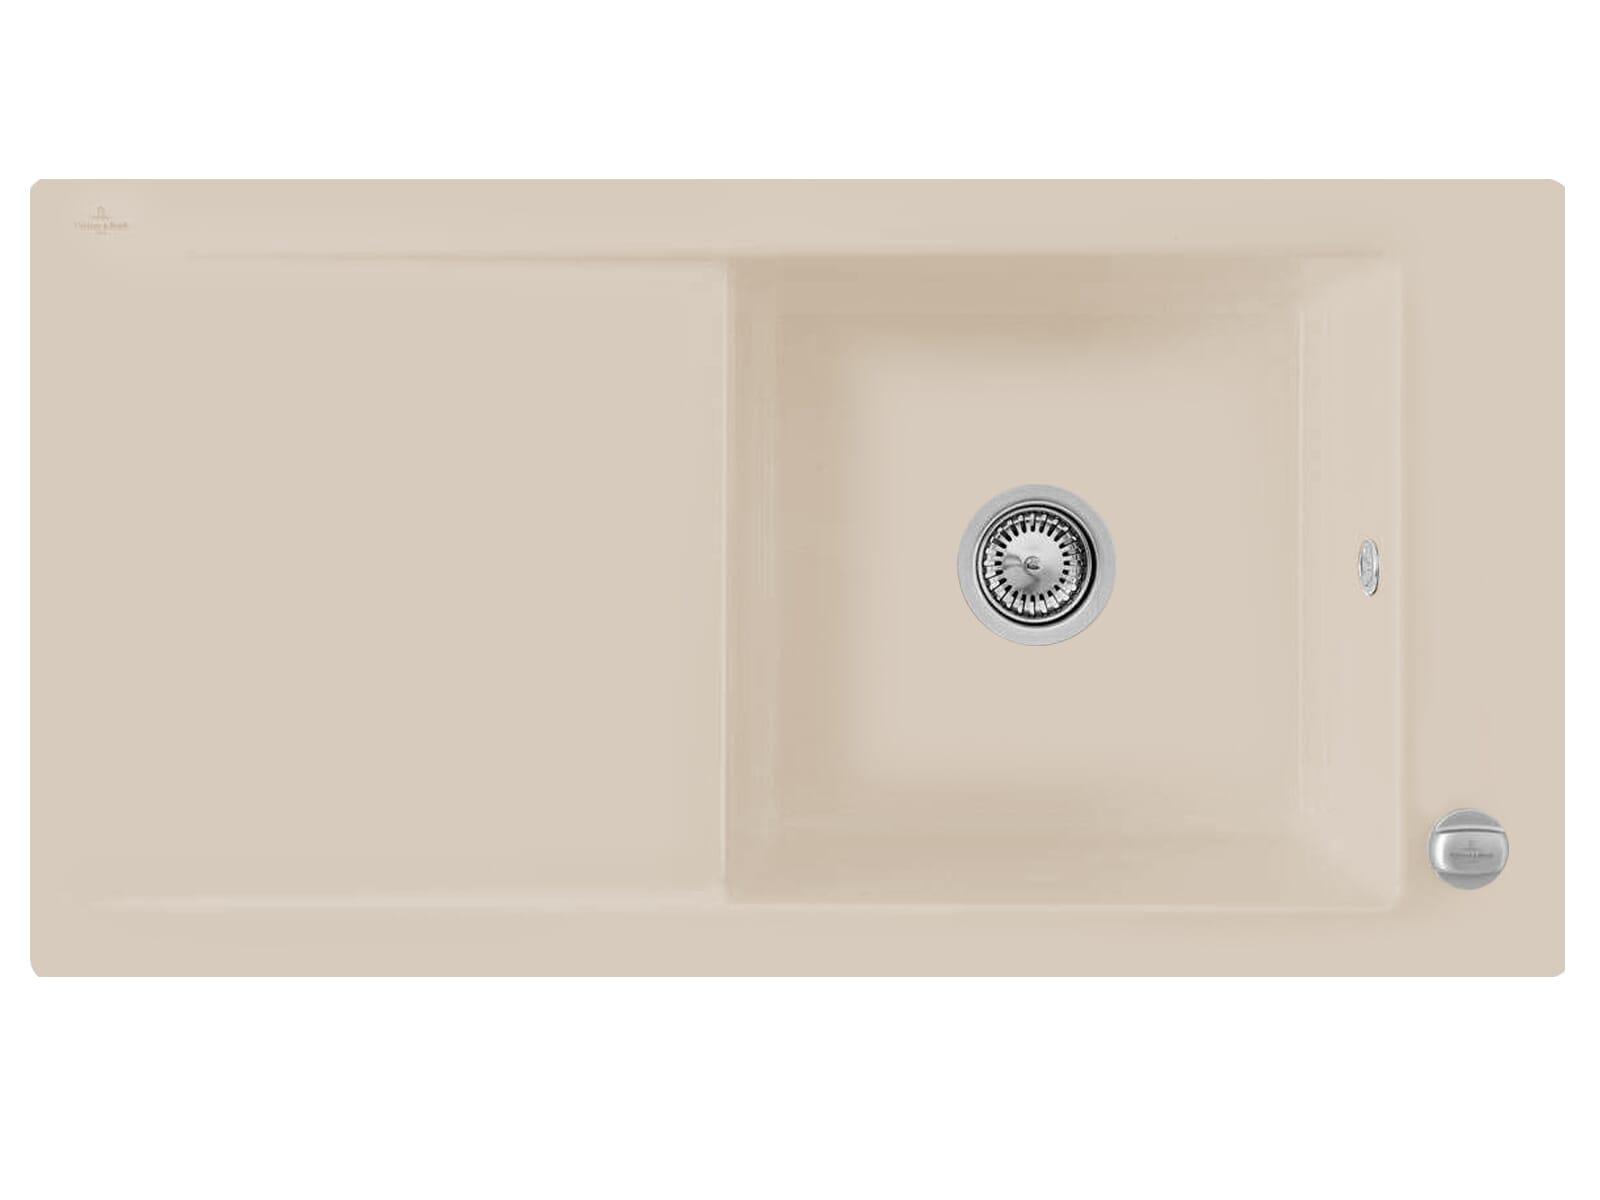 Villeroy & Boch Timeline 60 Almond - 6790 02 AM Keramikspüle Exzenterbetätigung